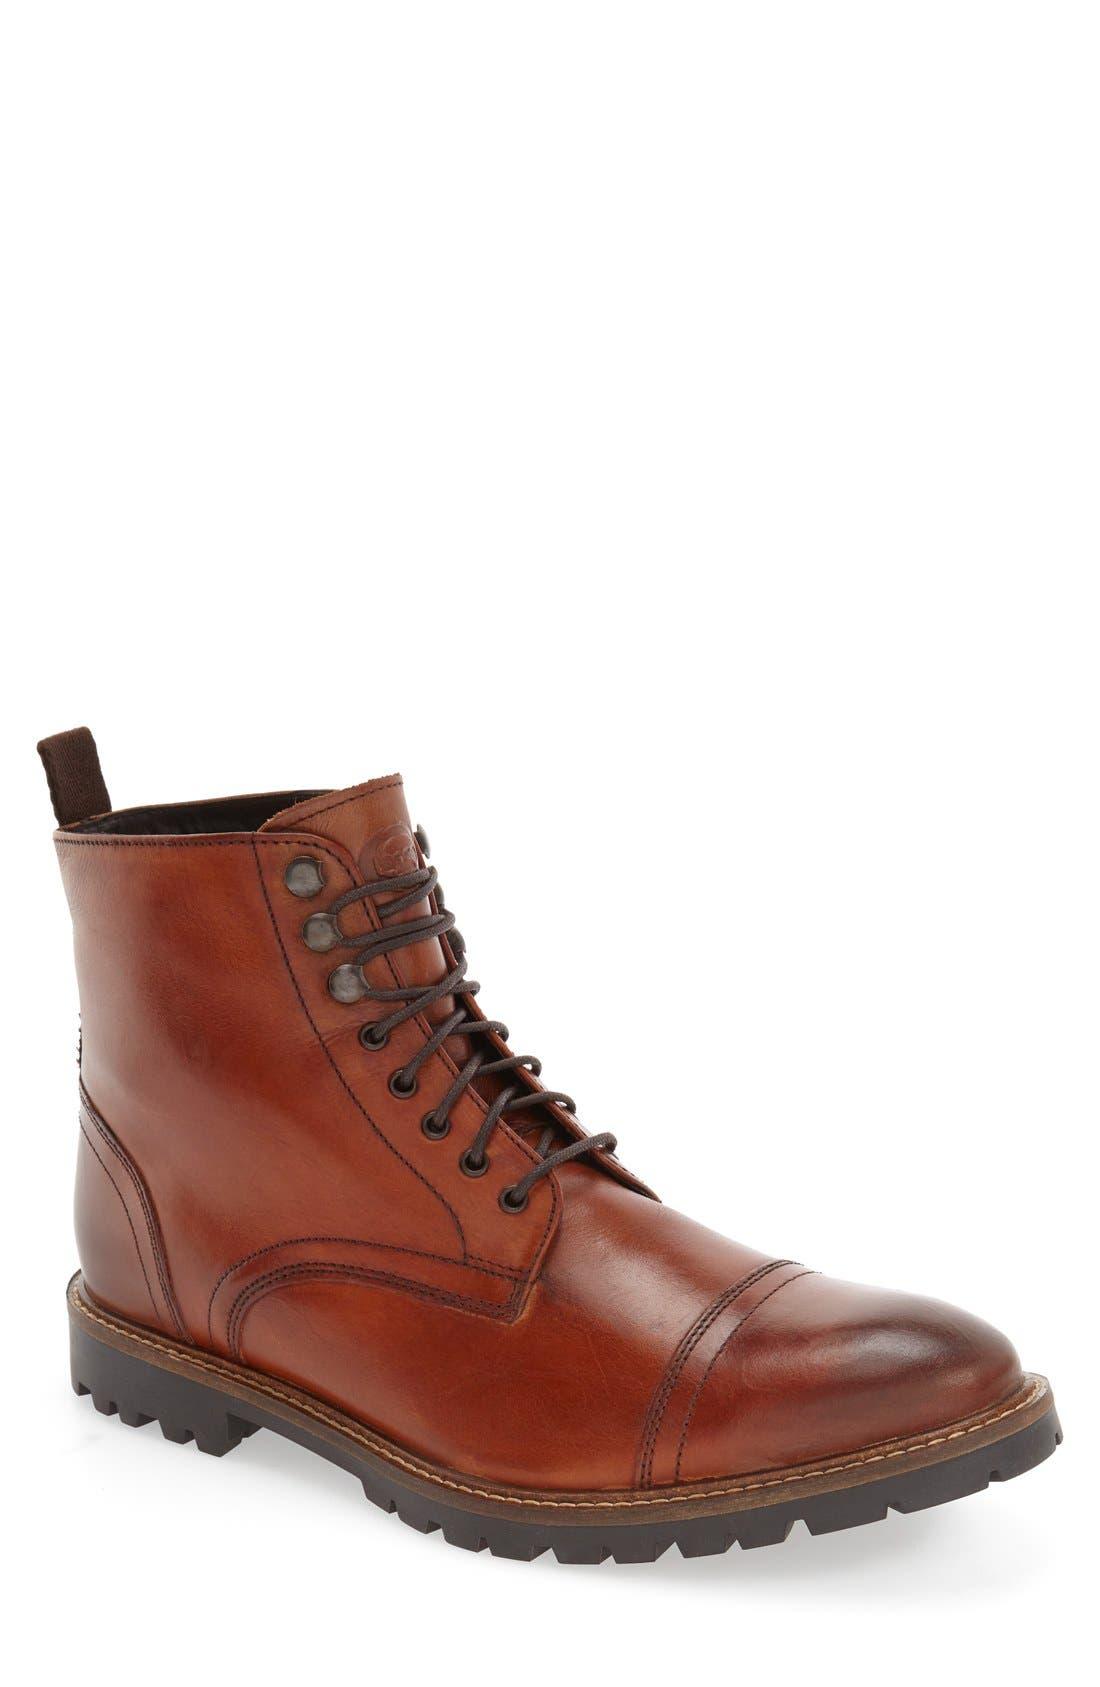 'Siege' Cap Toe Boot, Main, color, 210